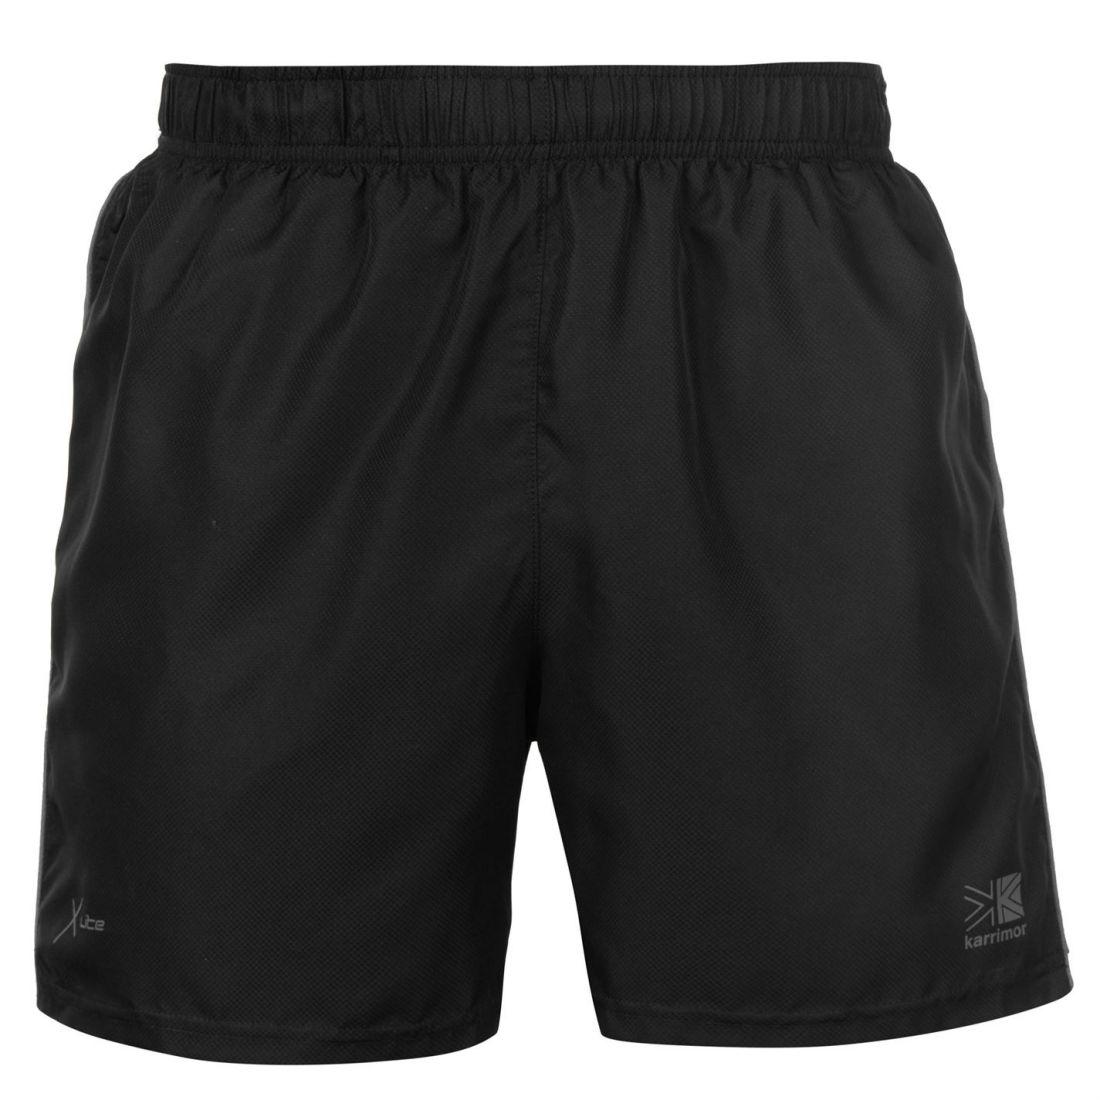 Karrimor-Xlite-5inch-Running-Shorts-Performance-Mens thumbnail 5